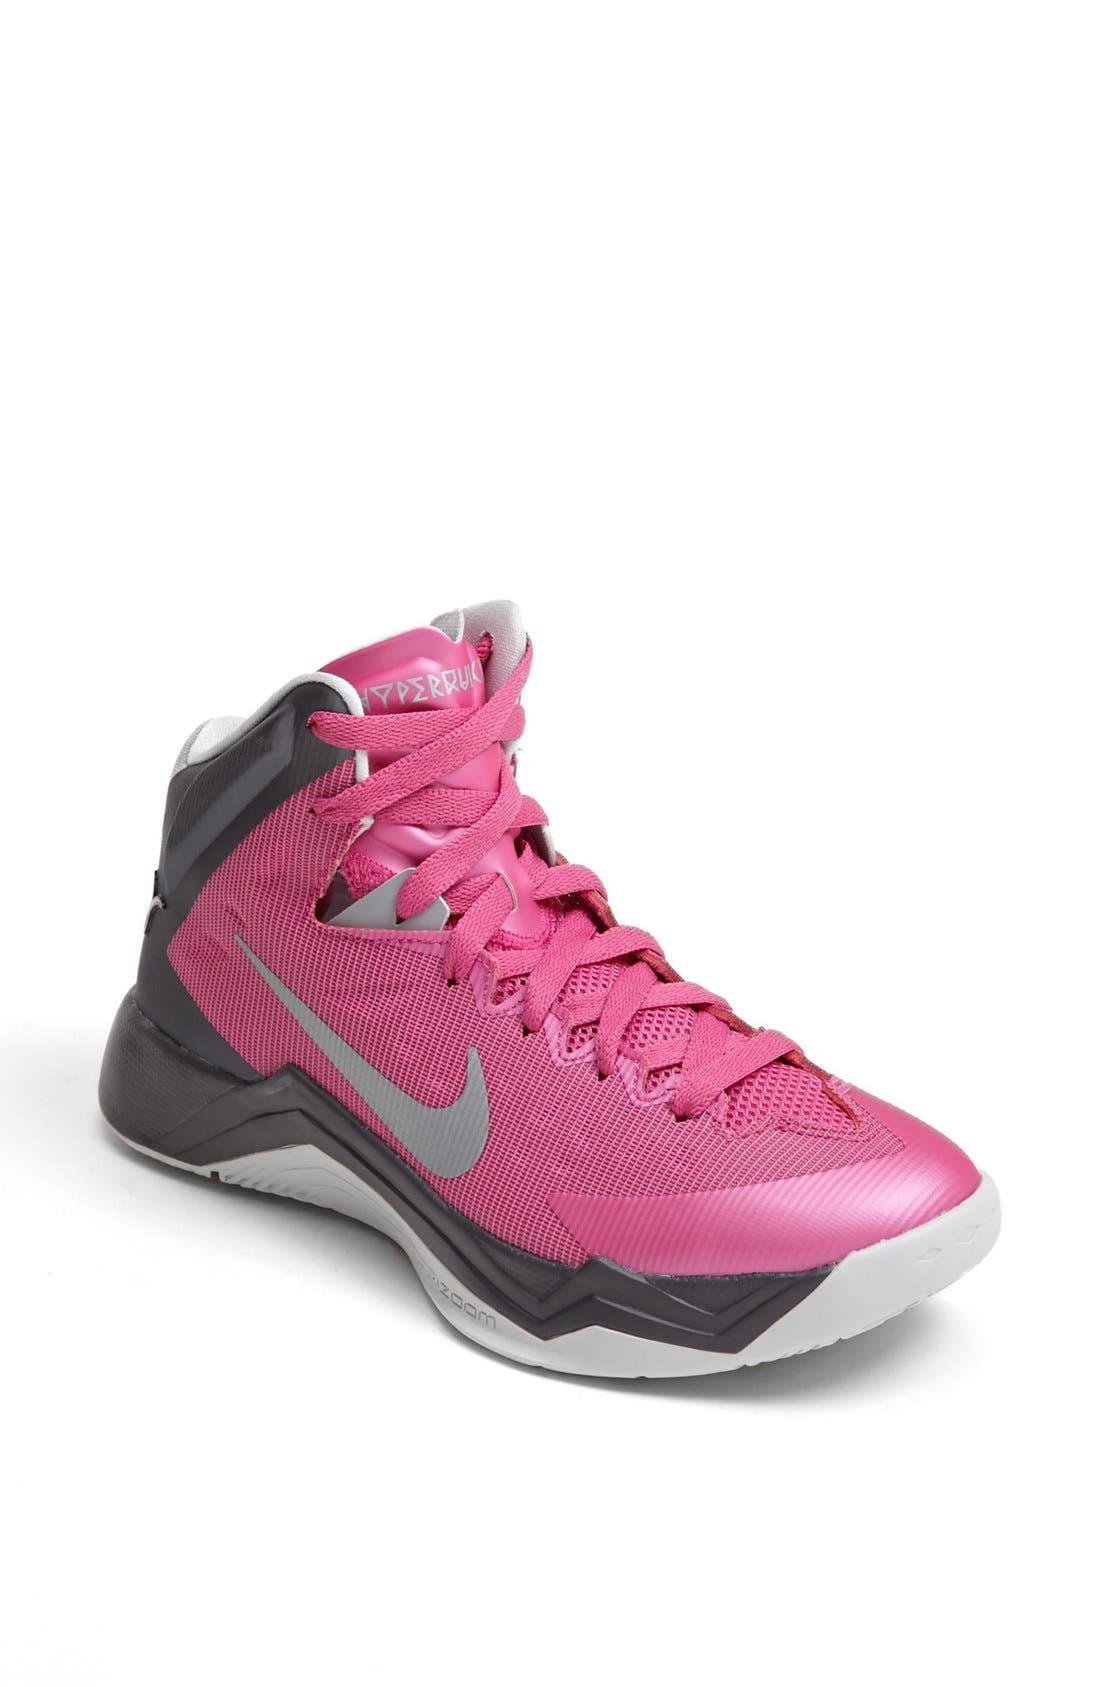 Main Image - Nike 'Hyper Quickness' Basketball Shoe (Women)